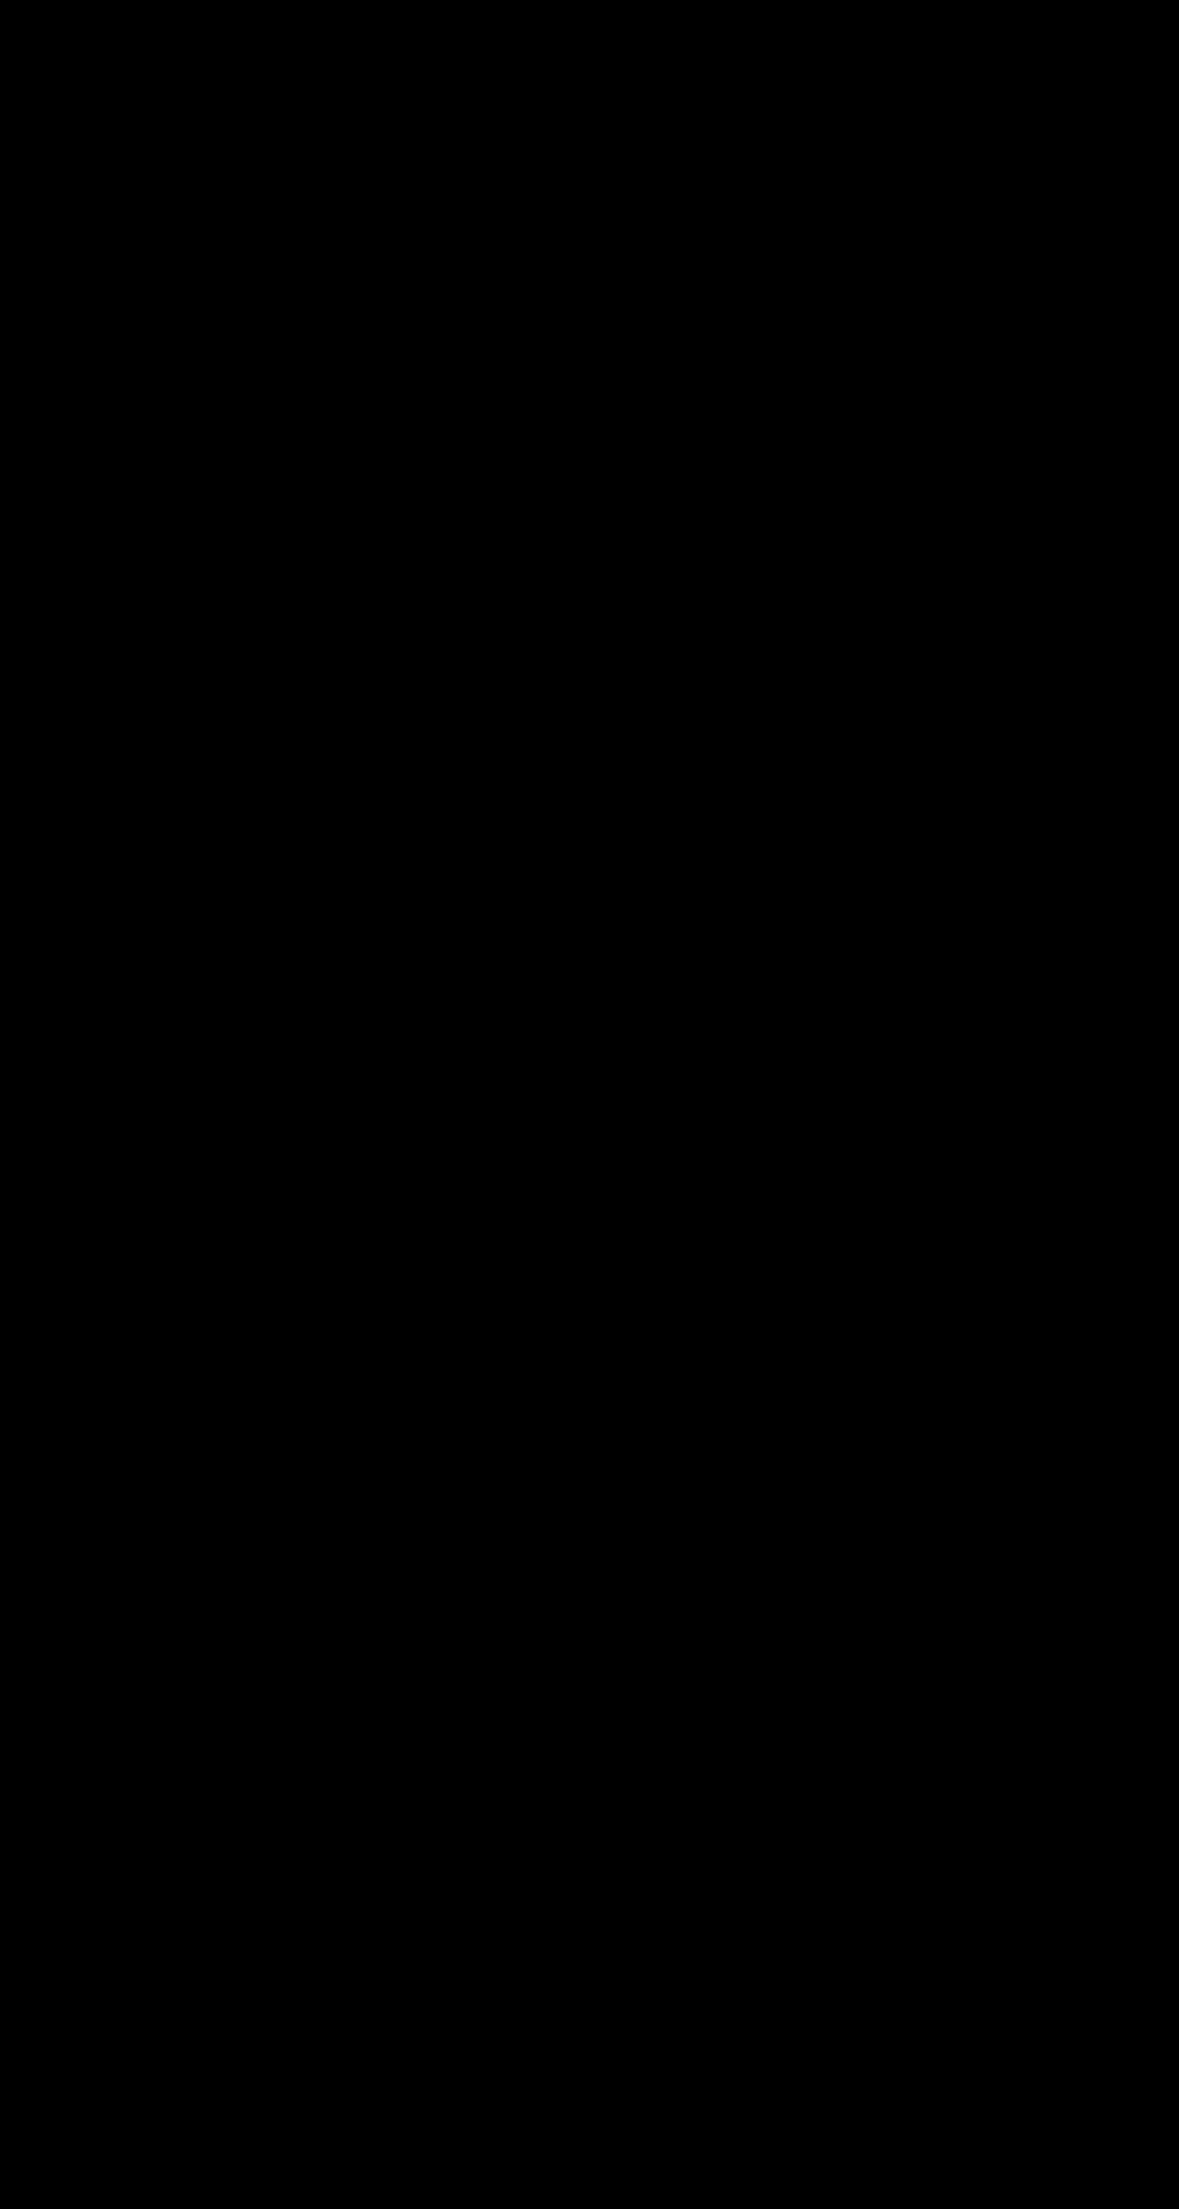 clipart majorette silhouette rh openclipart org majorette clipart free